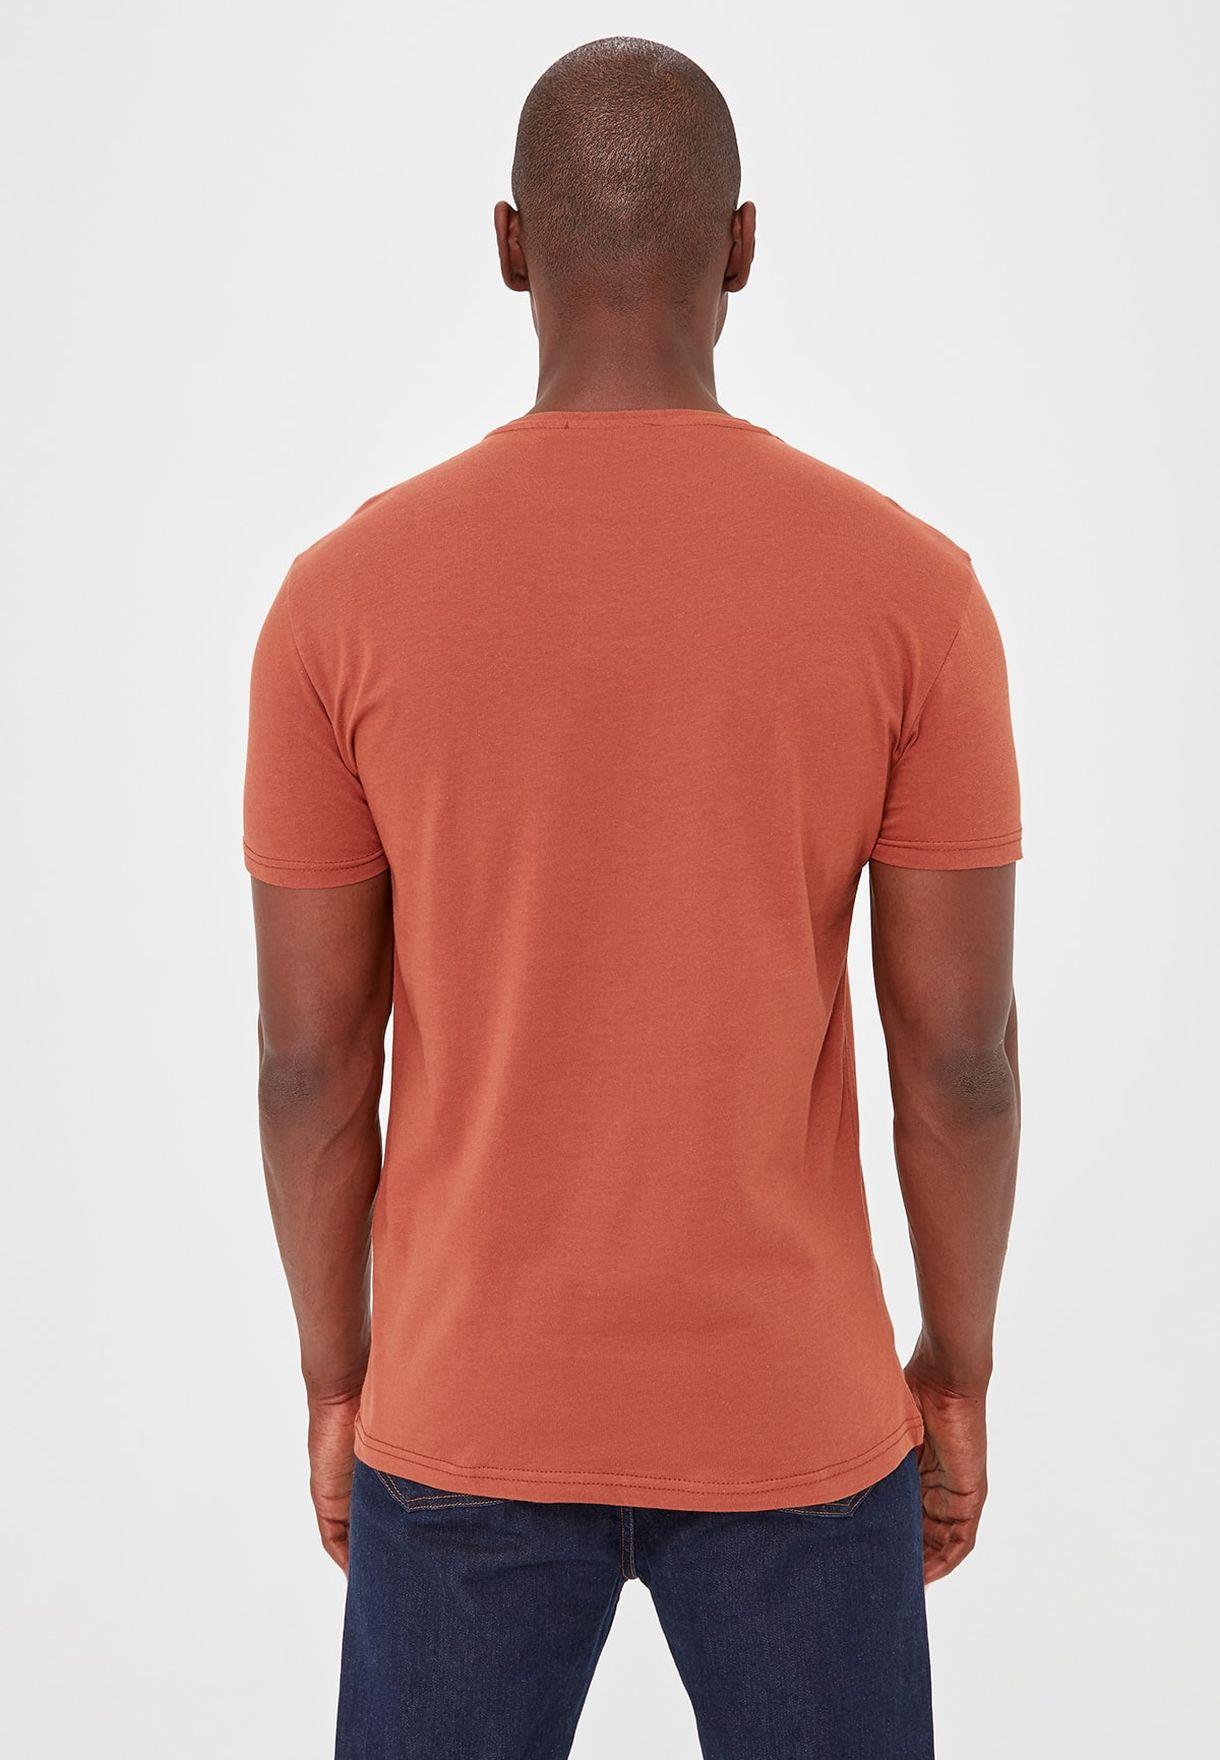 Make Some Noise Crew Neck T-Shirt